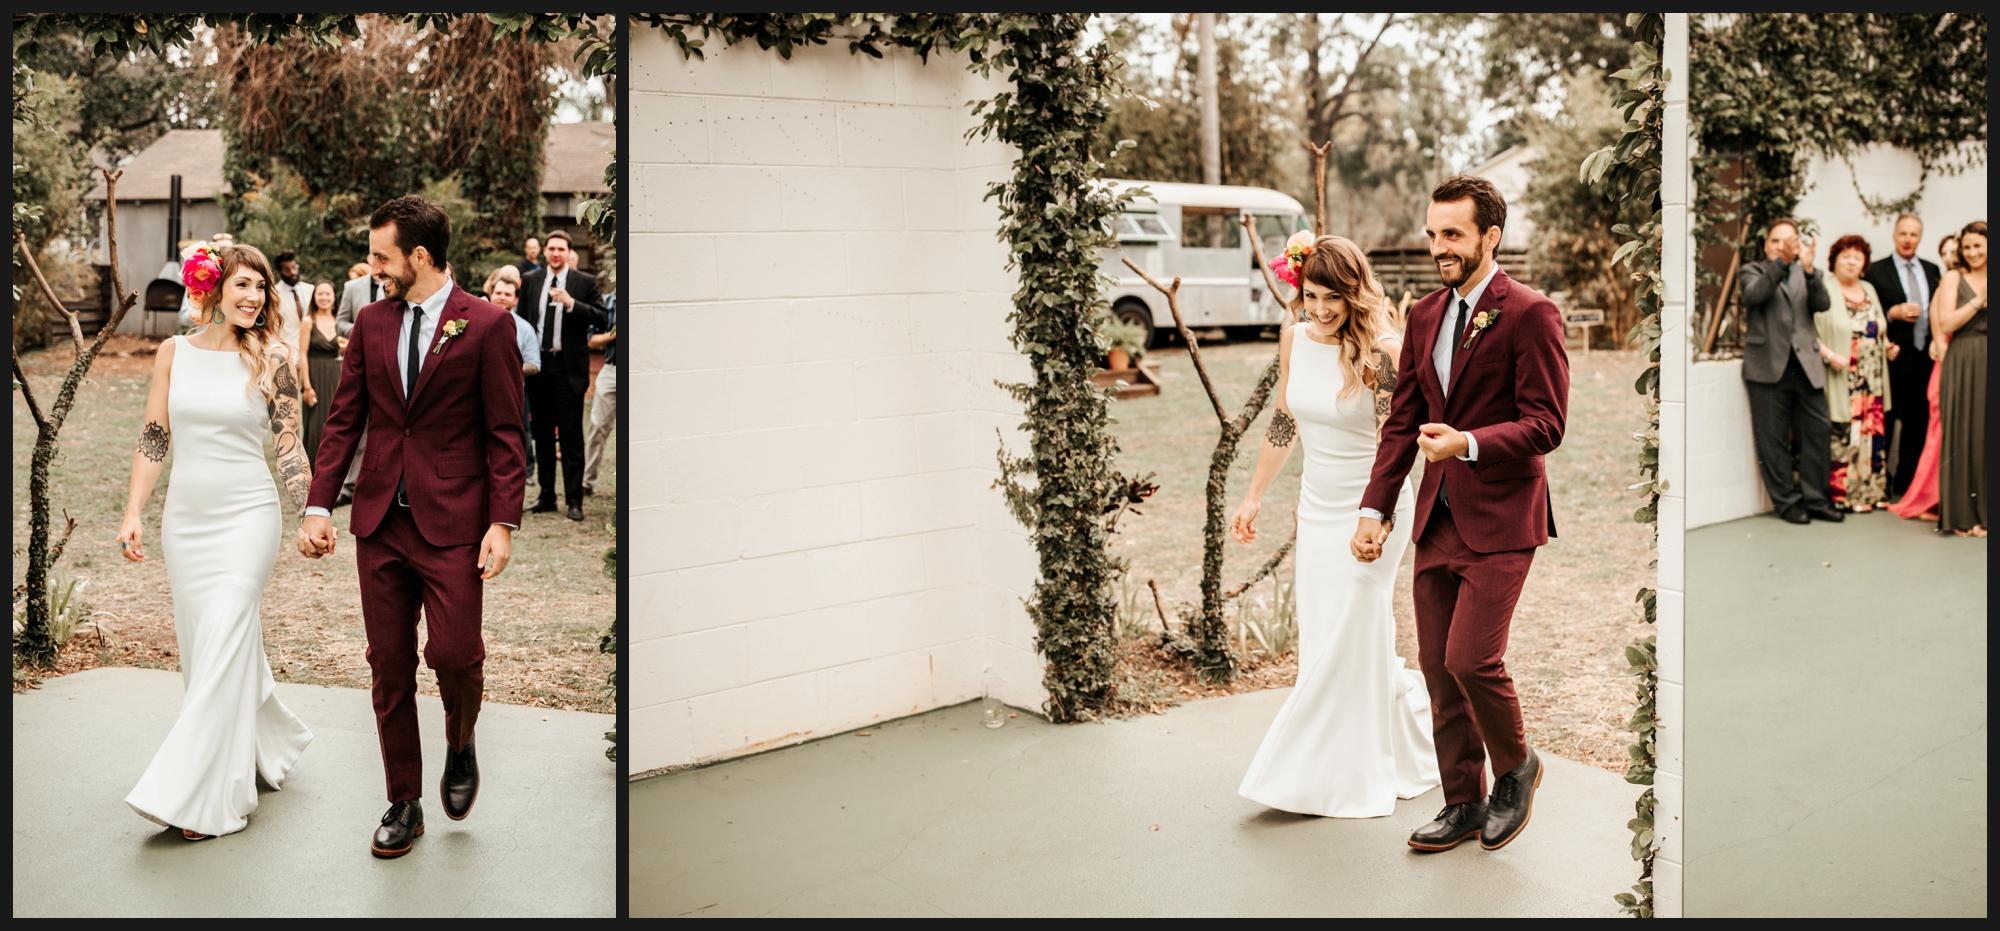 Orlando-Wedding-Photographer-destination-wedding-photographer-florida-wedding-photographer-bohemian-wedding-photographer_1950.jpg